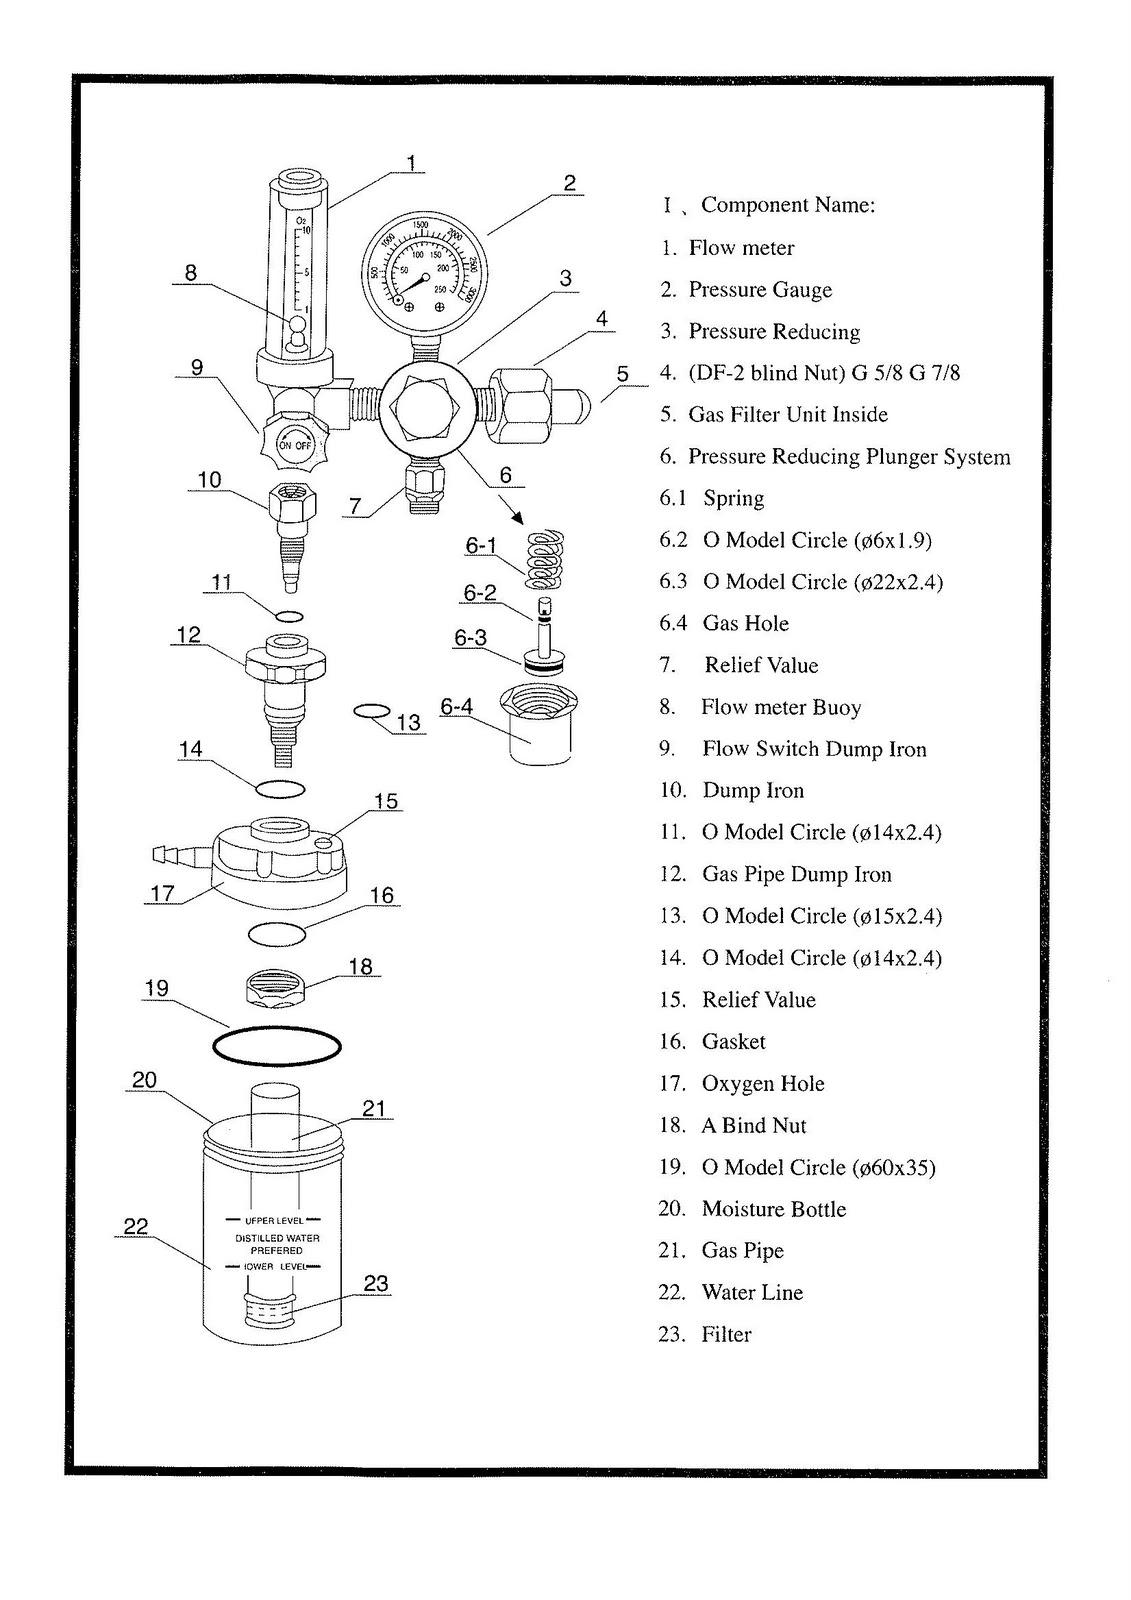 Medical Regulator Instrument Pump Valve And Heat Exchanger